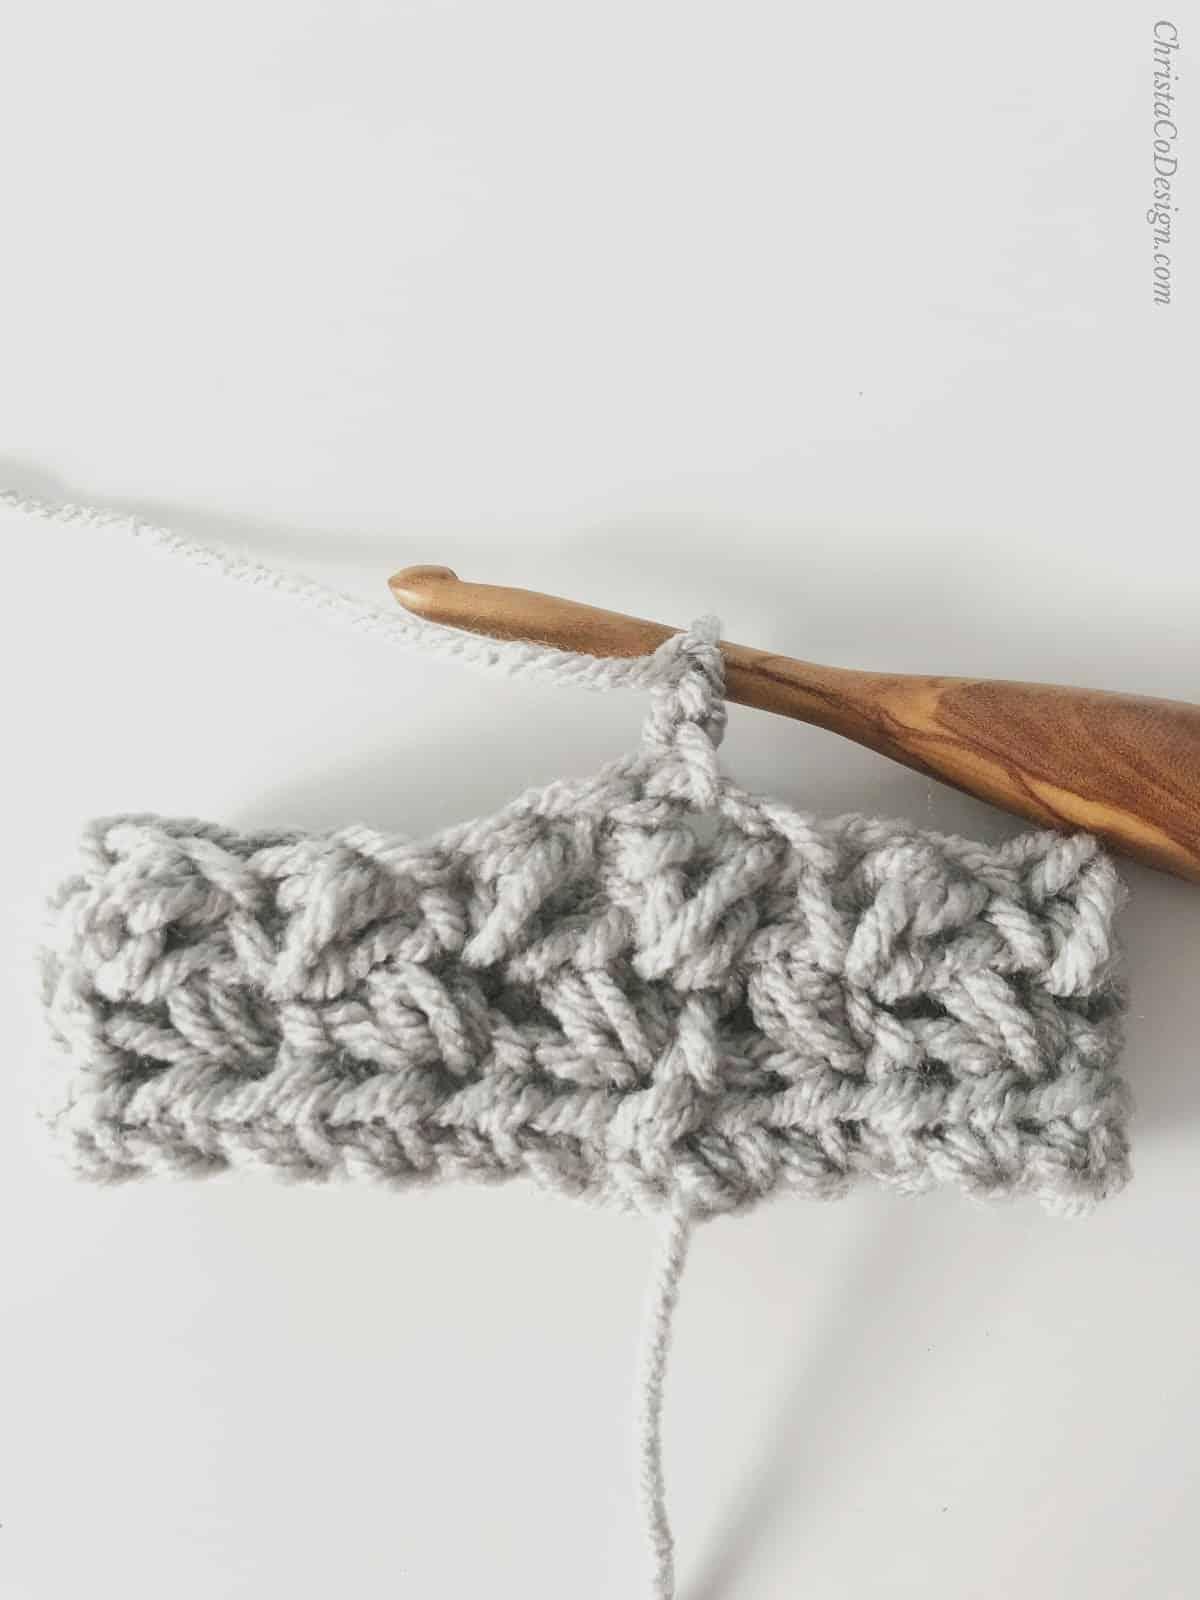 picture of crochet cozy